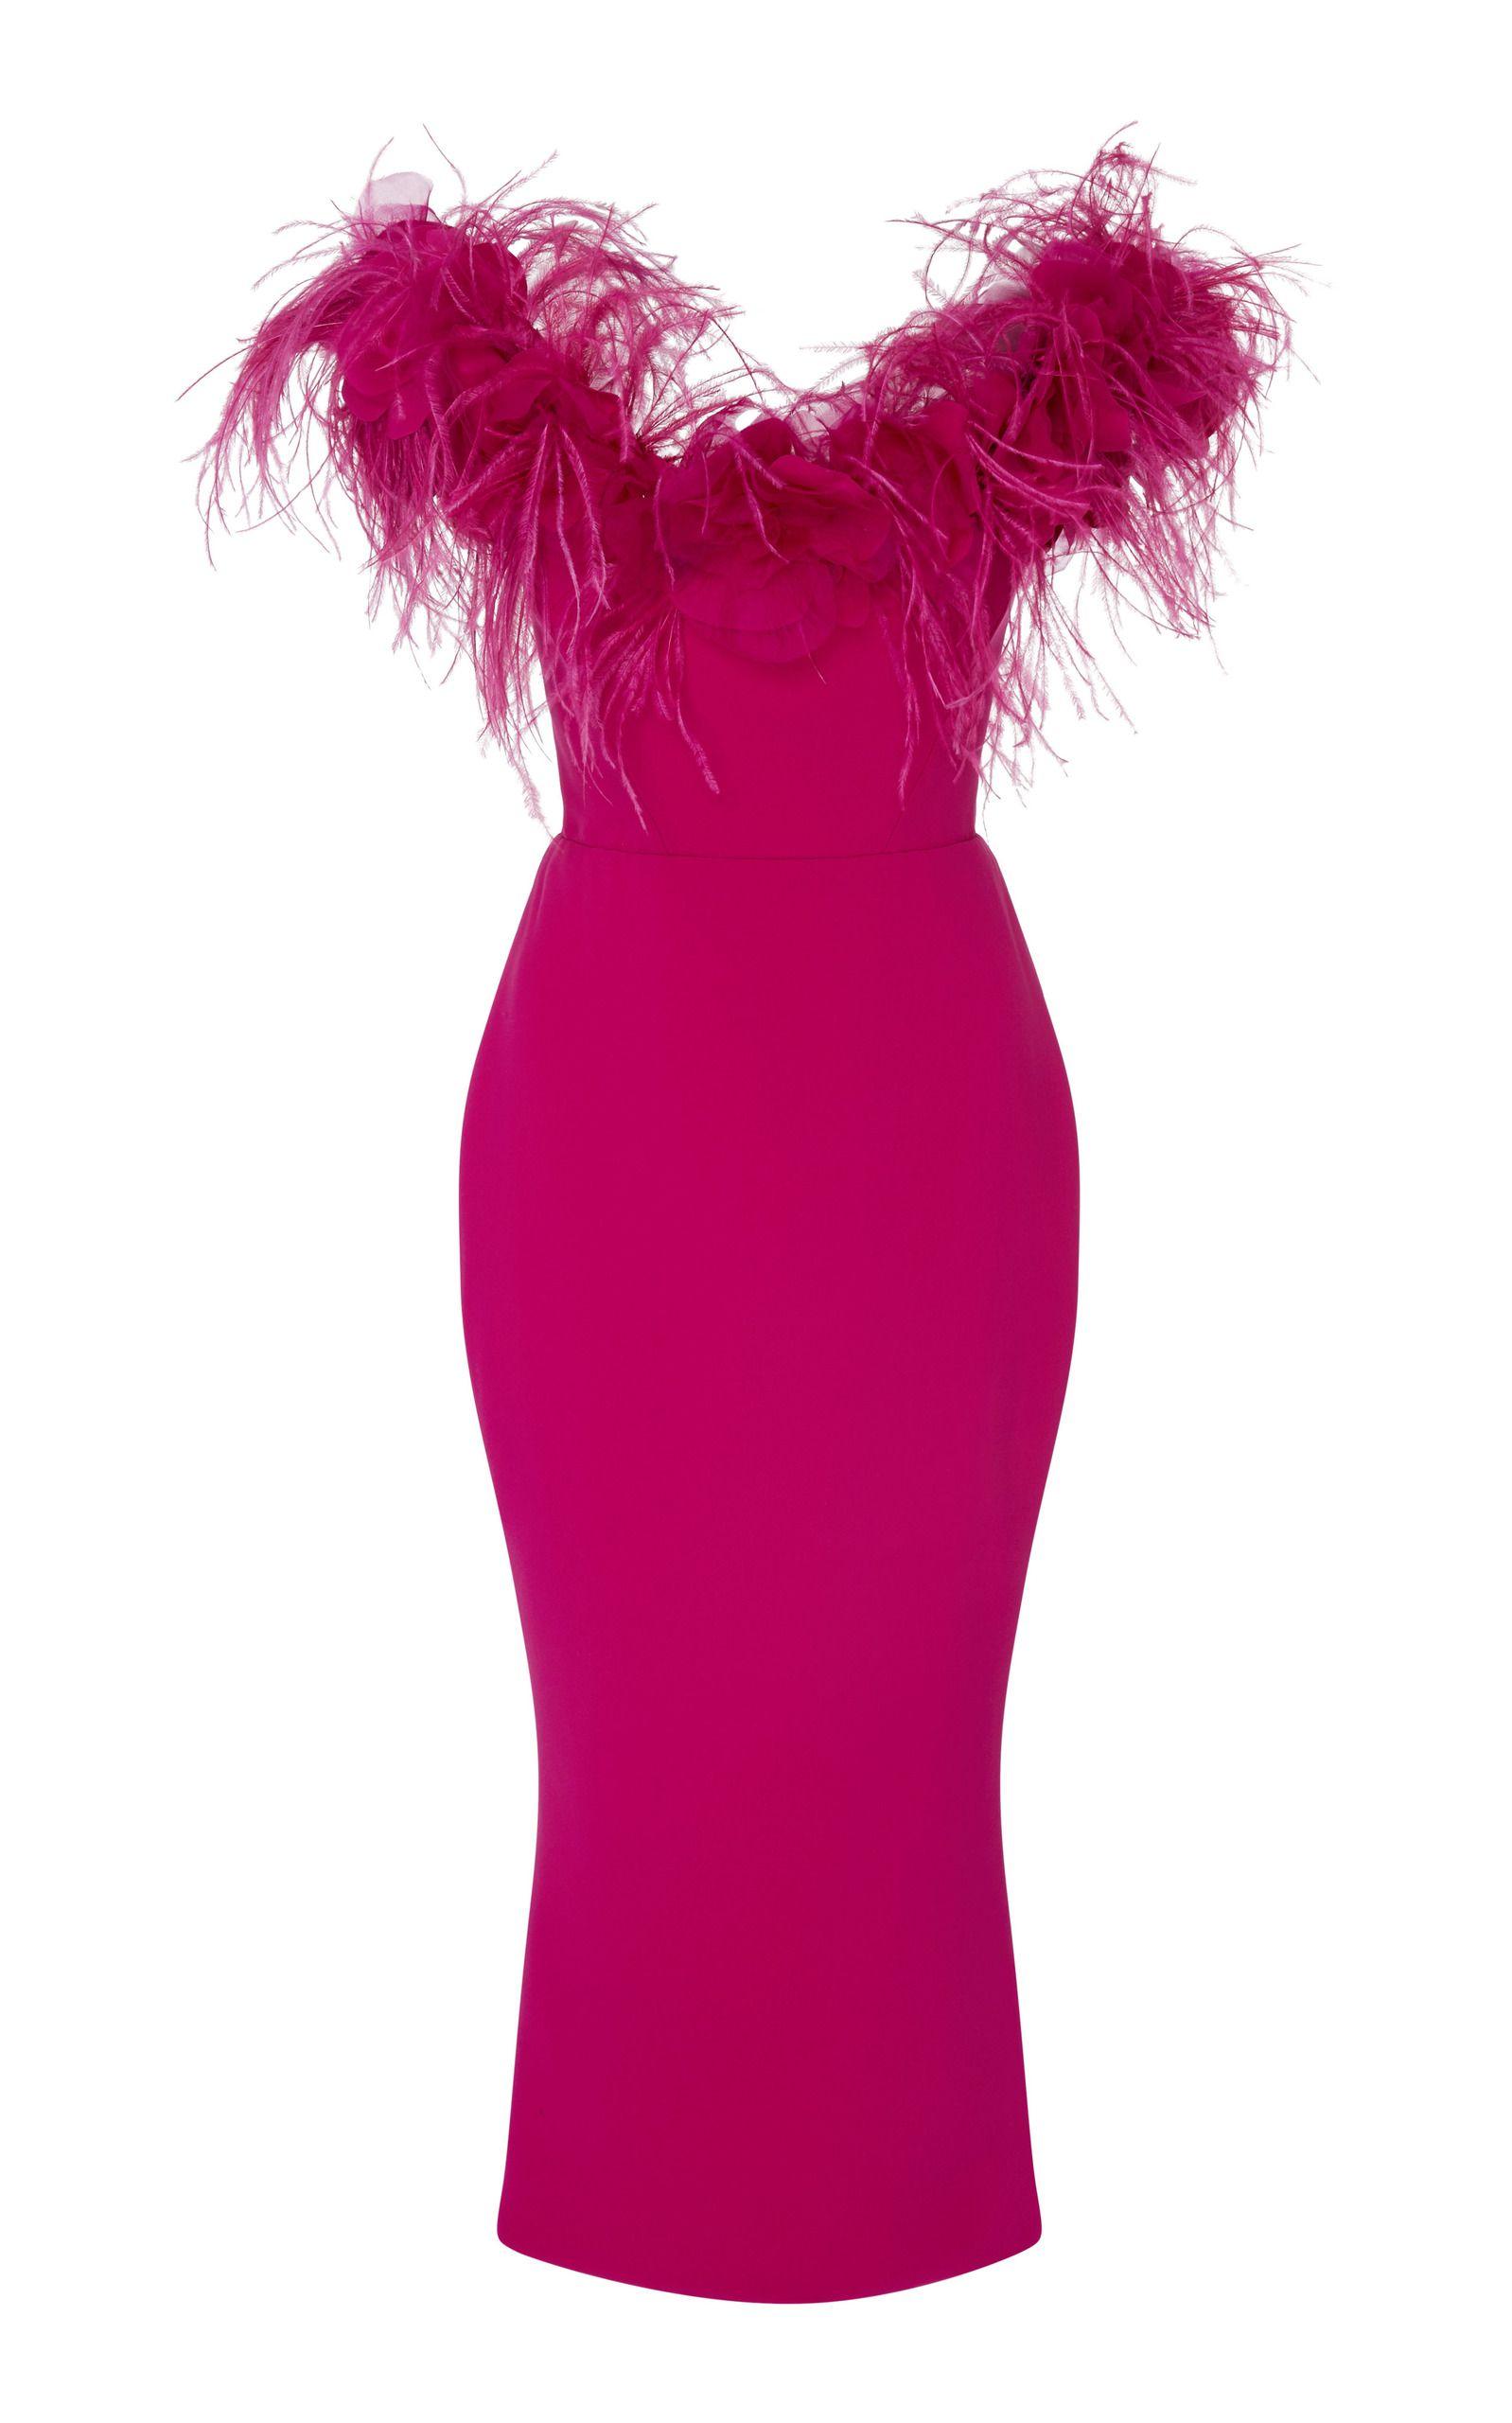 f7184373e090 Off The Shoulder Feather Midi Dress by MARCHESA for Preorder on Moda  Operandi